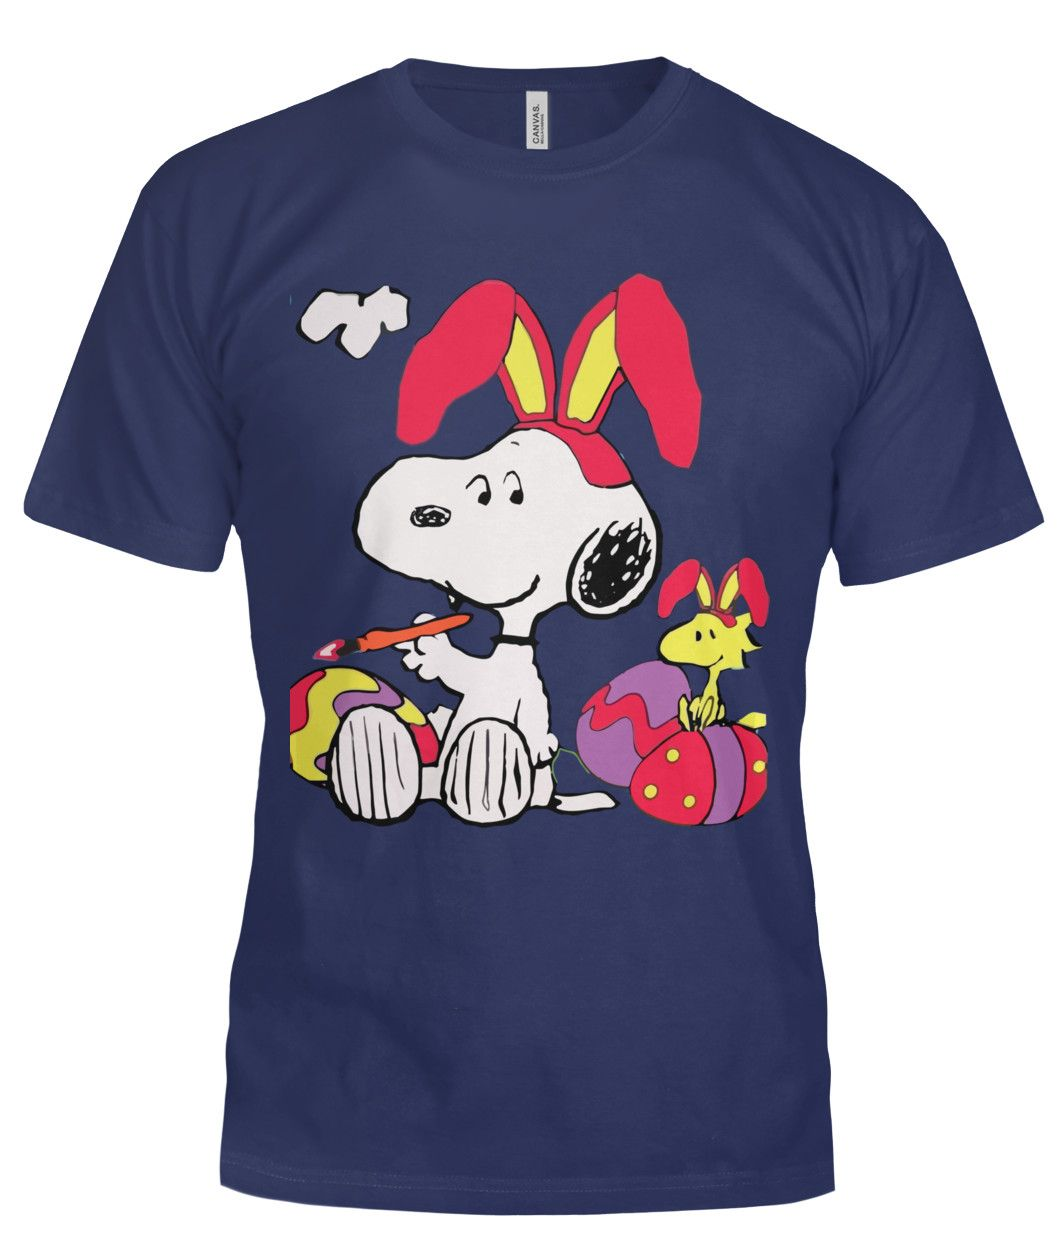 Peanuts Snoopy Woodstock Easter Eggs Spring Cute Unisex Kids Tee Youth T-Shirt